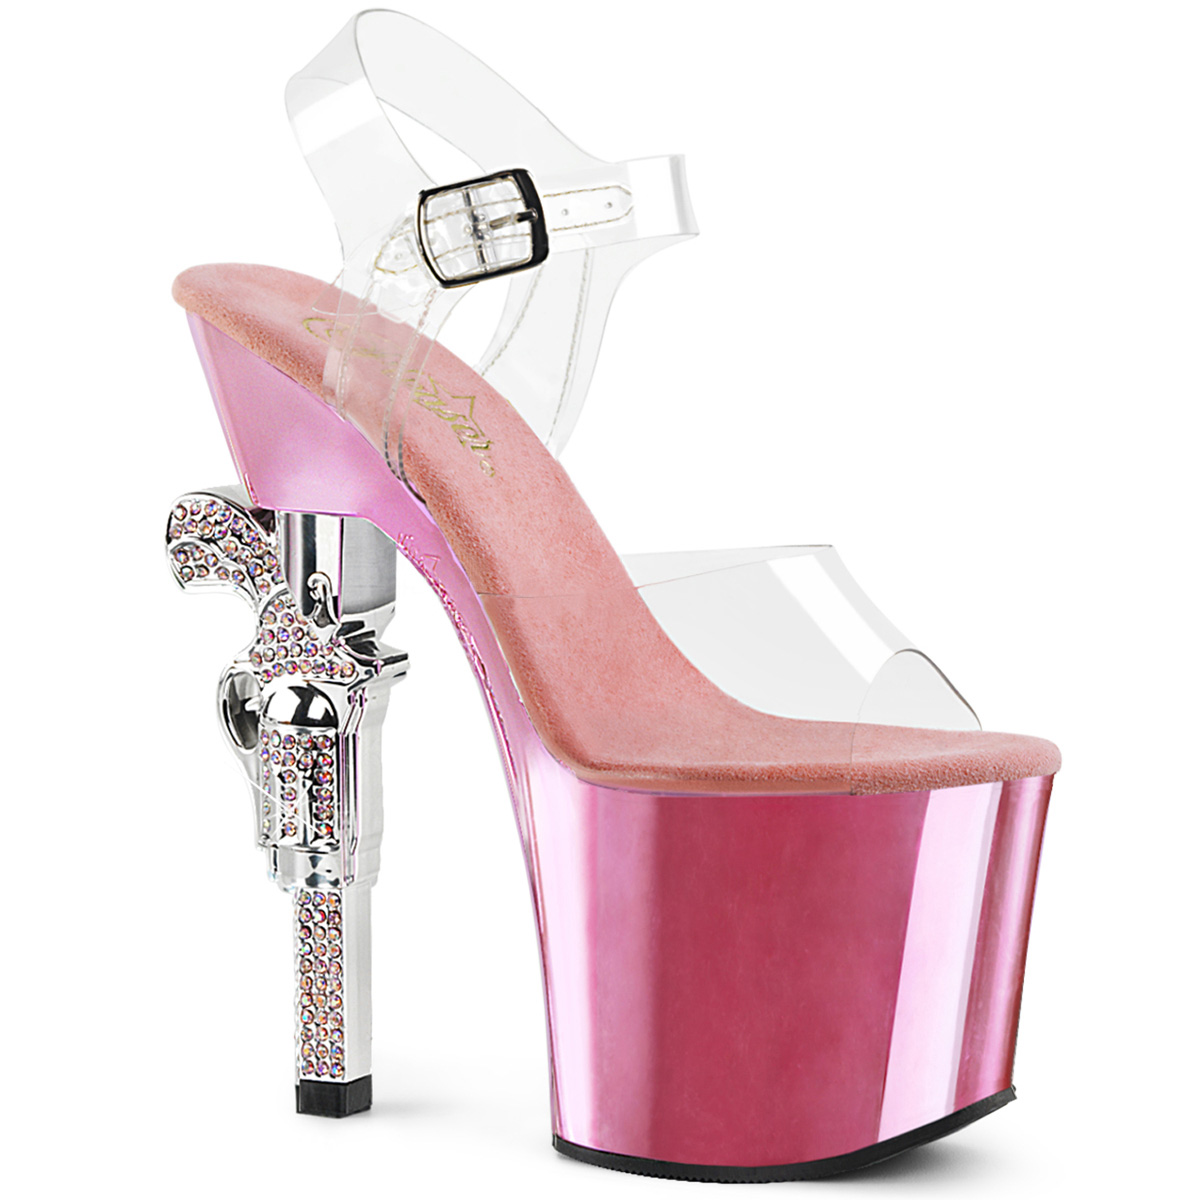 e0039dd9779 Platform High Heels REVOLVER-708 - Baby Pink Chrome